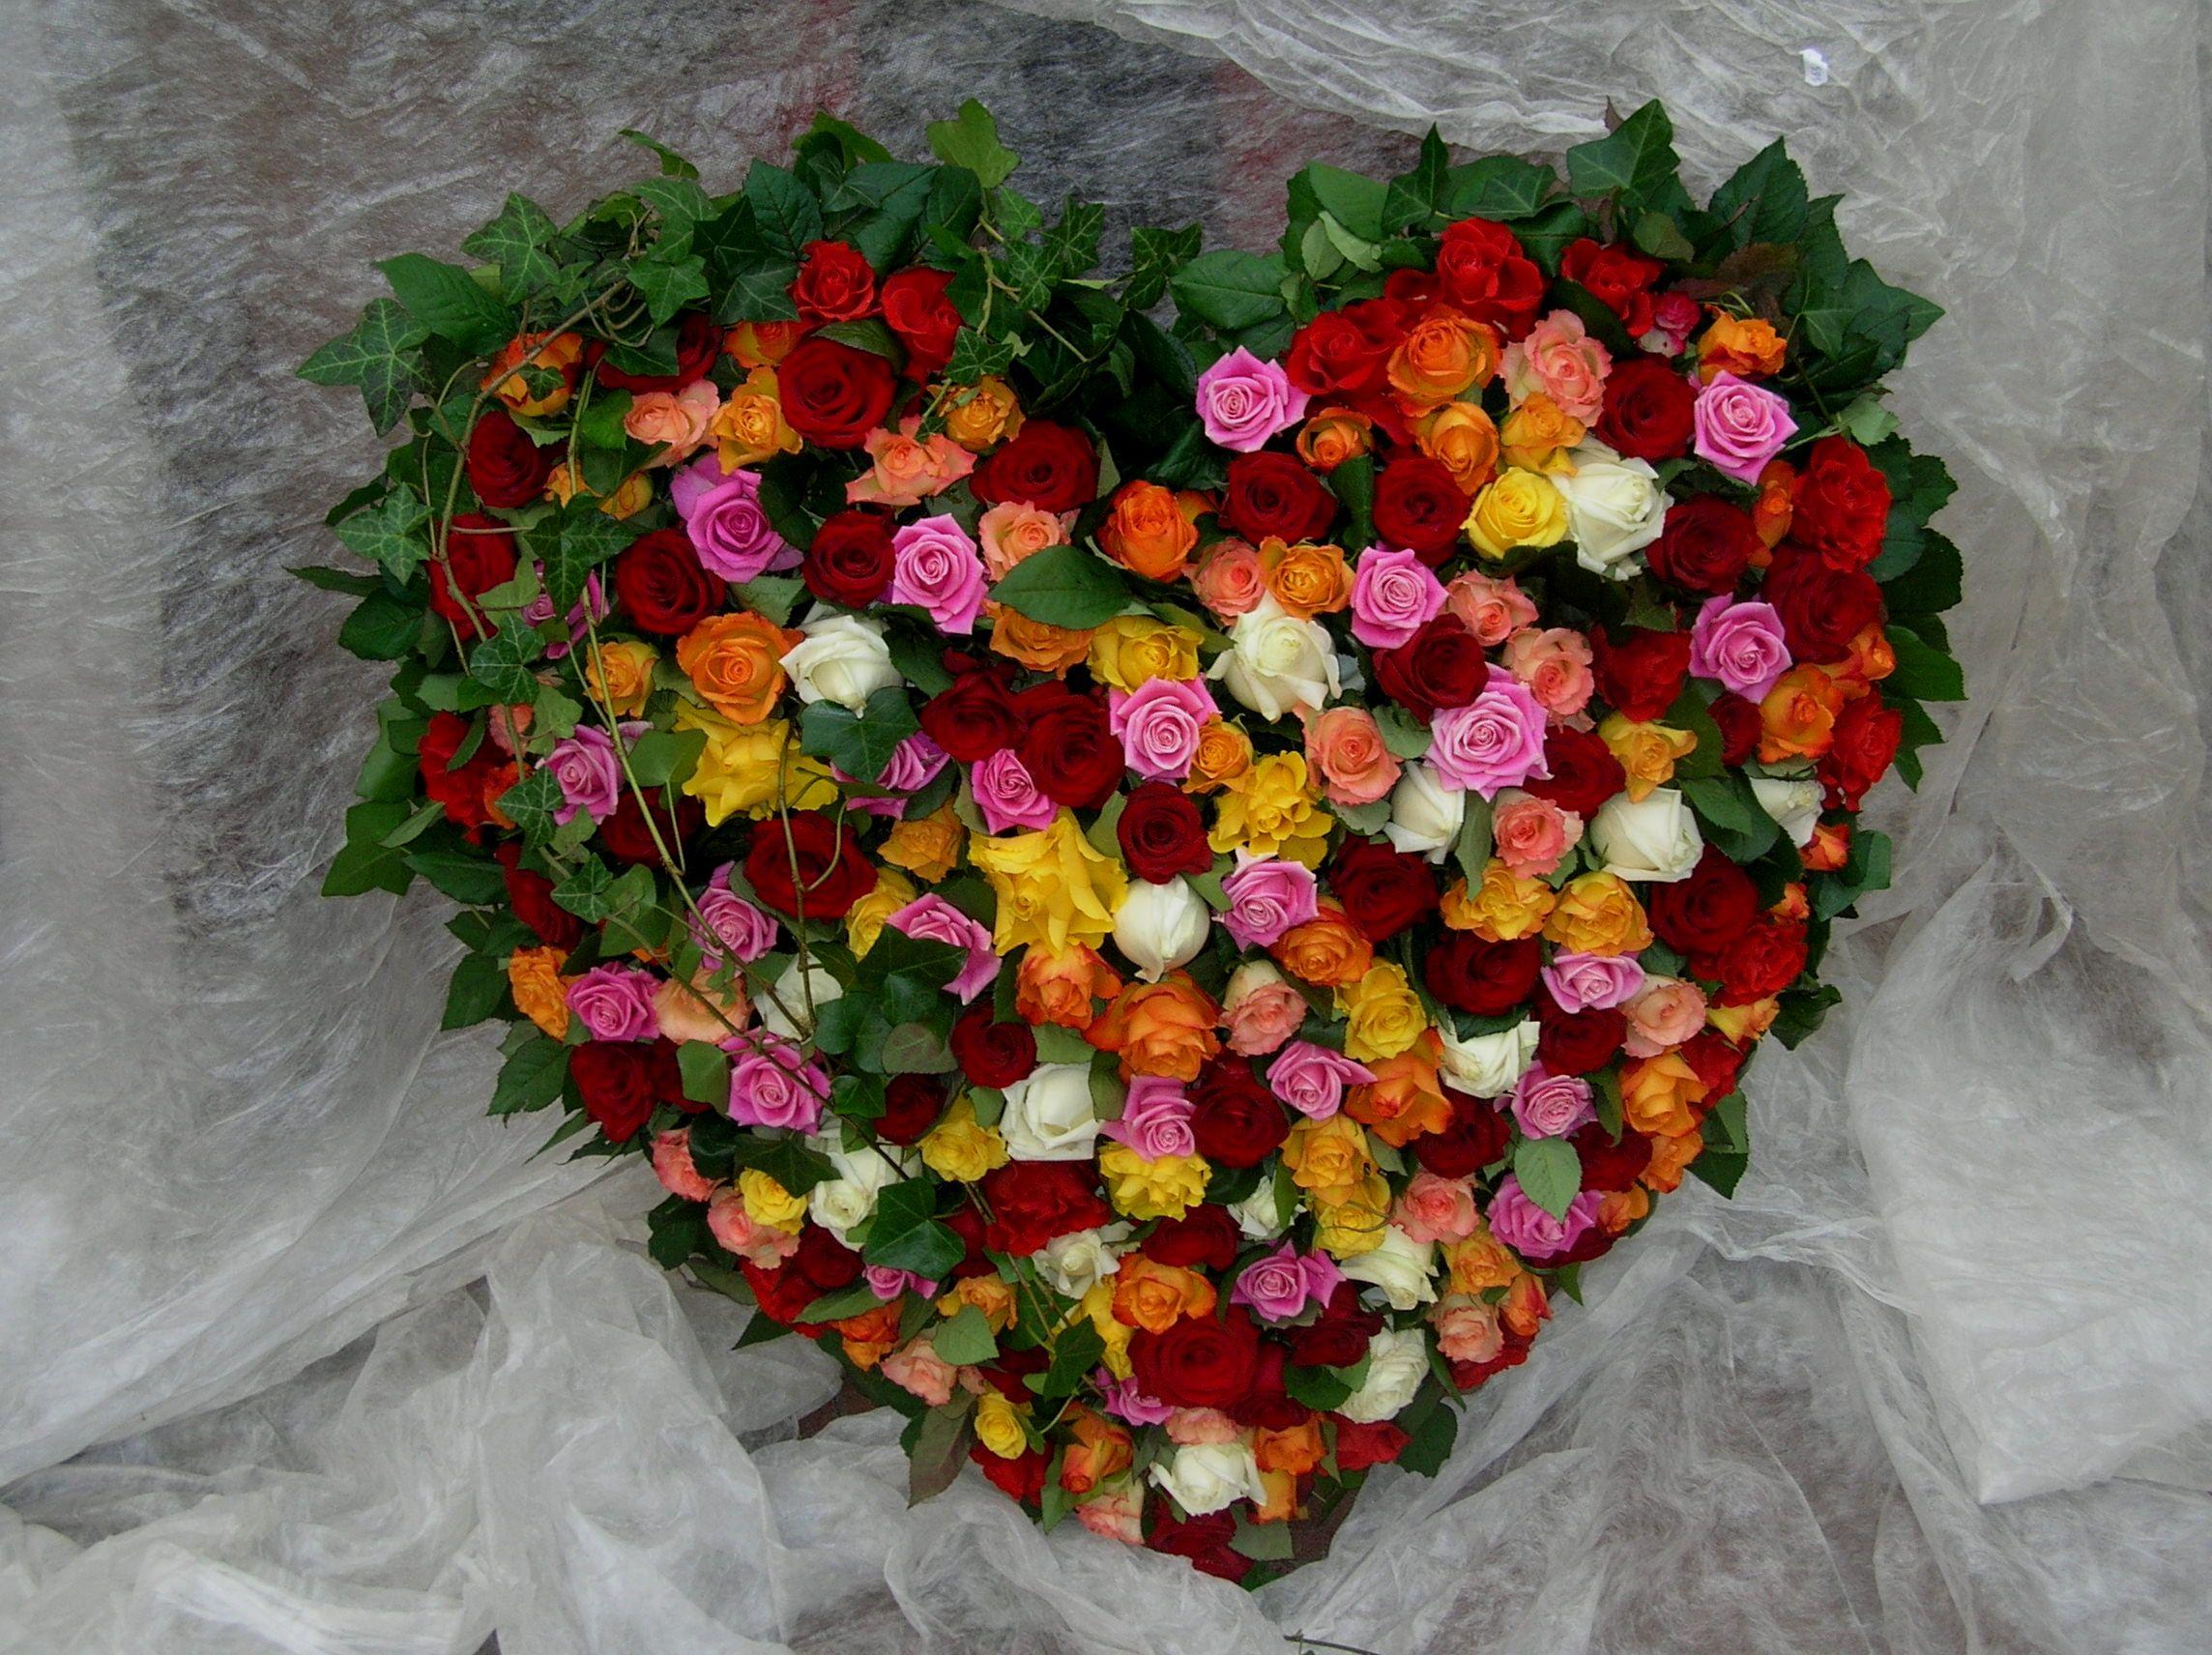 Blumen Weese - Floristik, Gärtnerei